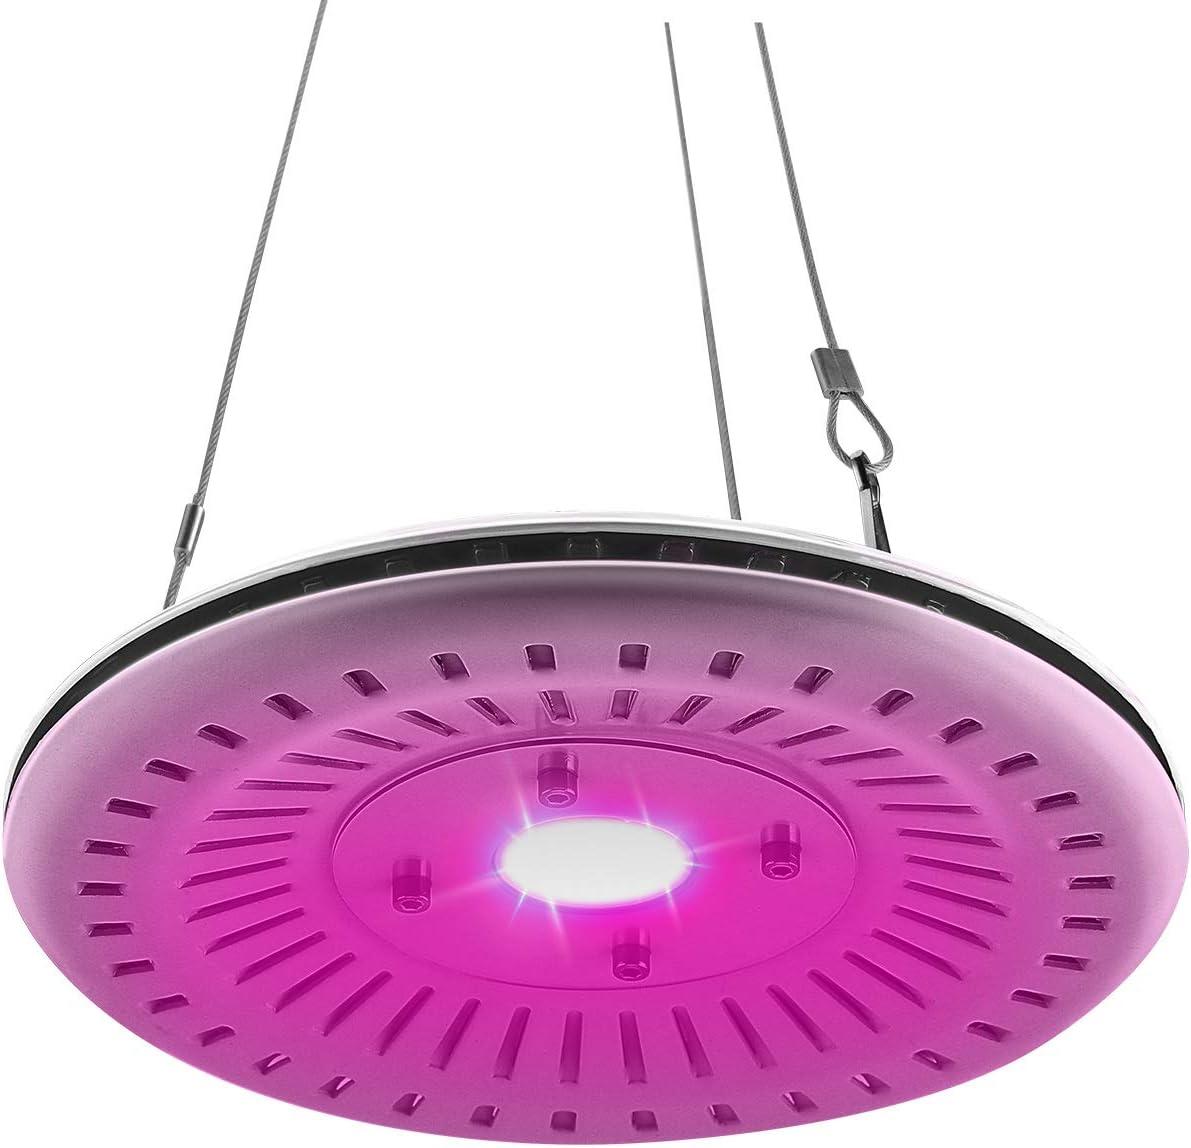 FECiDA 40W UFO LED Grow Light Waterproof, 200W CFL Grow Light Bulb Equivalent, Professional Full Spectrum LED Plant Grow Light for Succulents, Tomato, Lettuce, Seedlings, Indoor Vegetables Growing